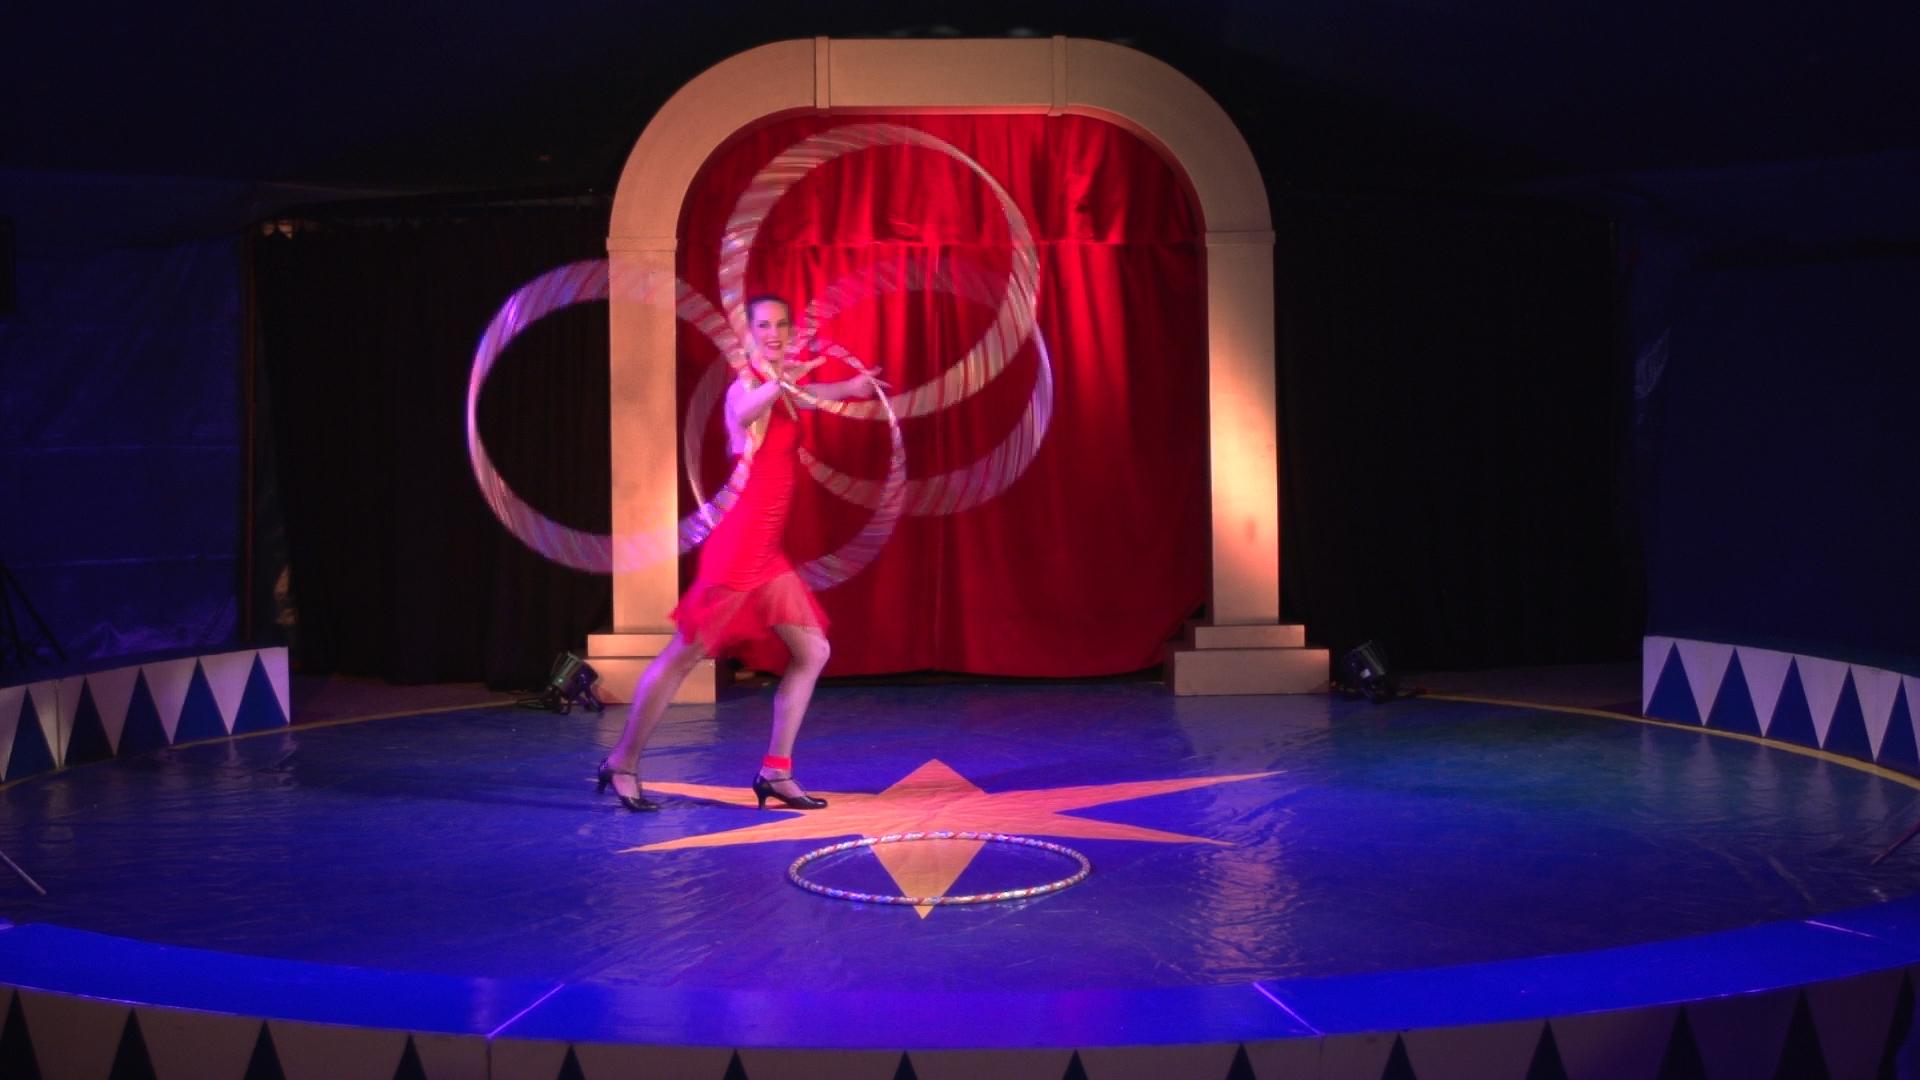 Laura-Cohen-Hula-Hoop-Show-circusevents-koeln-2